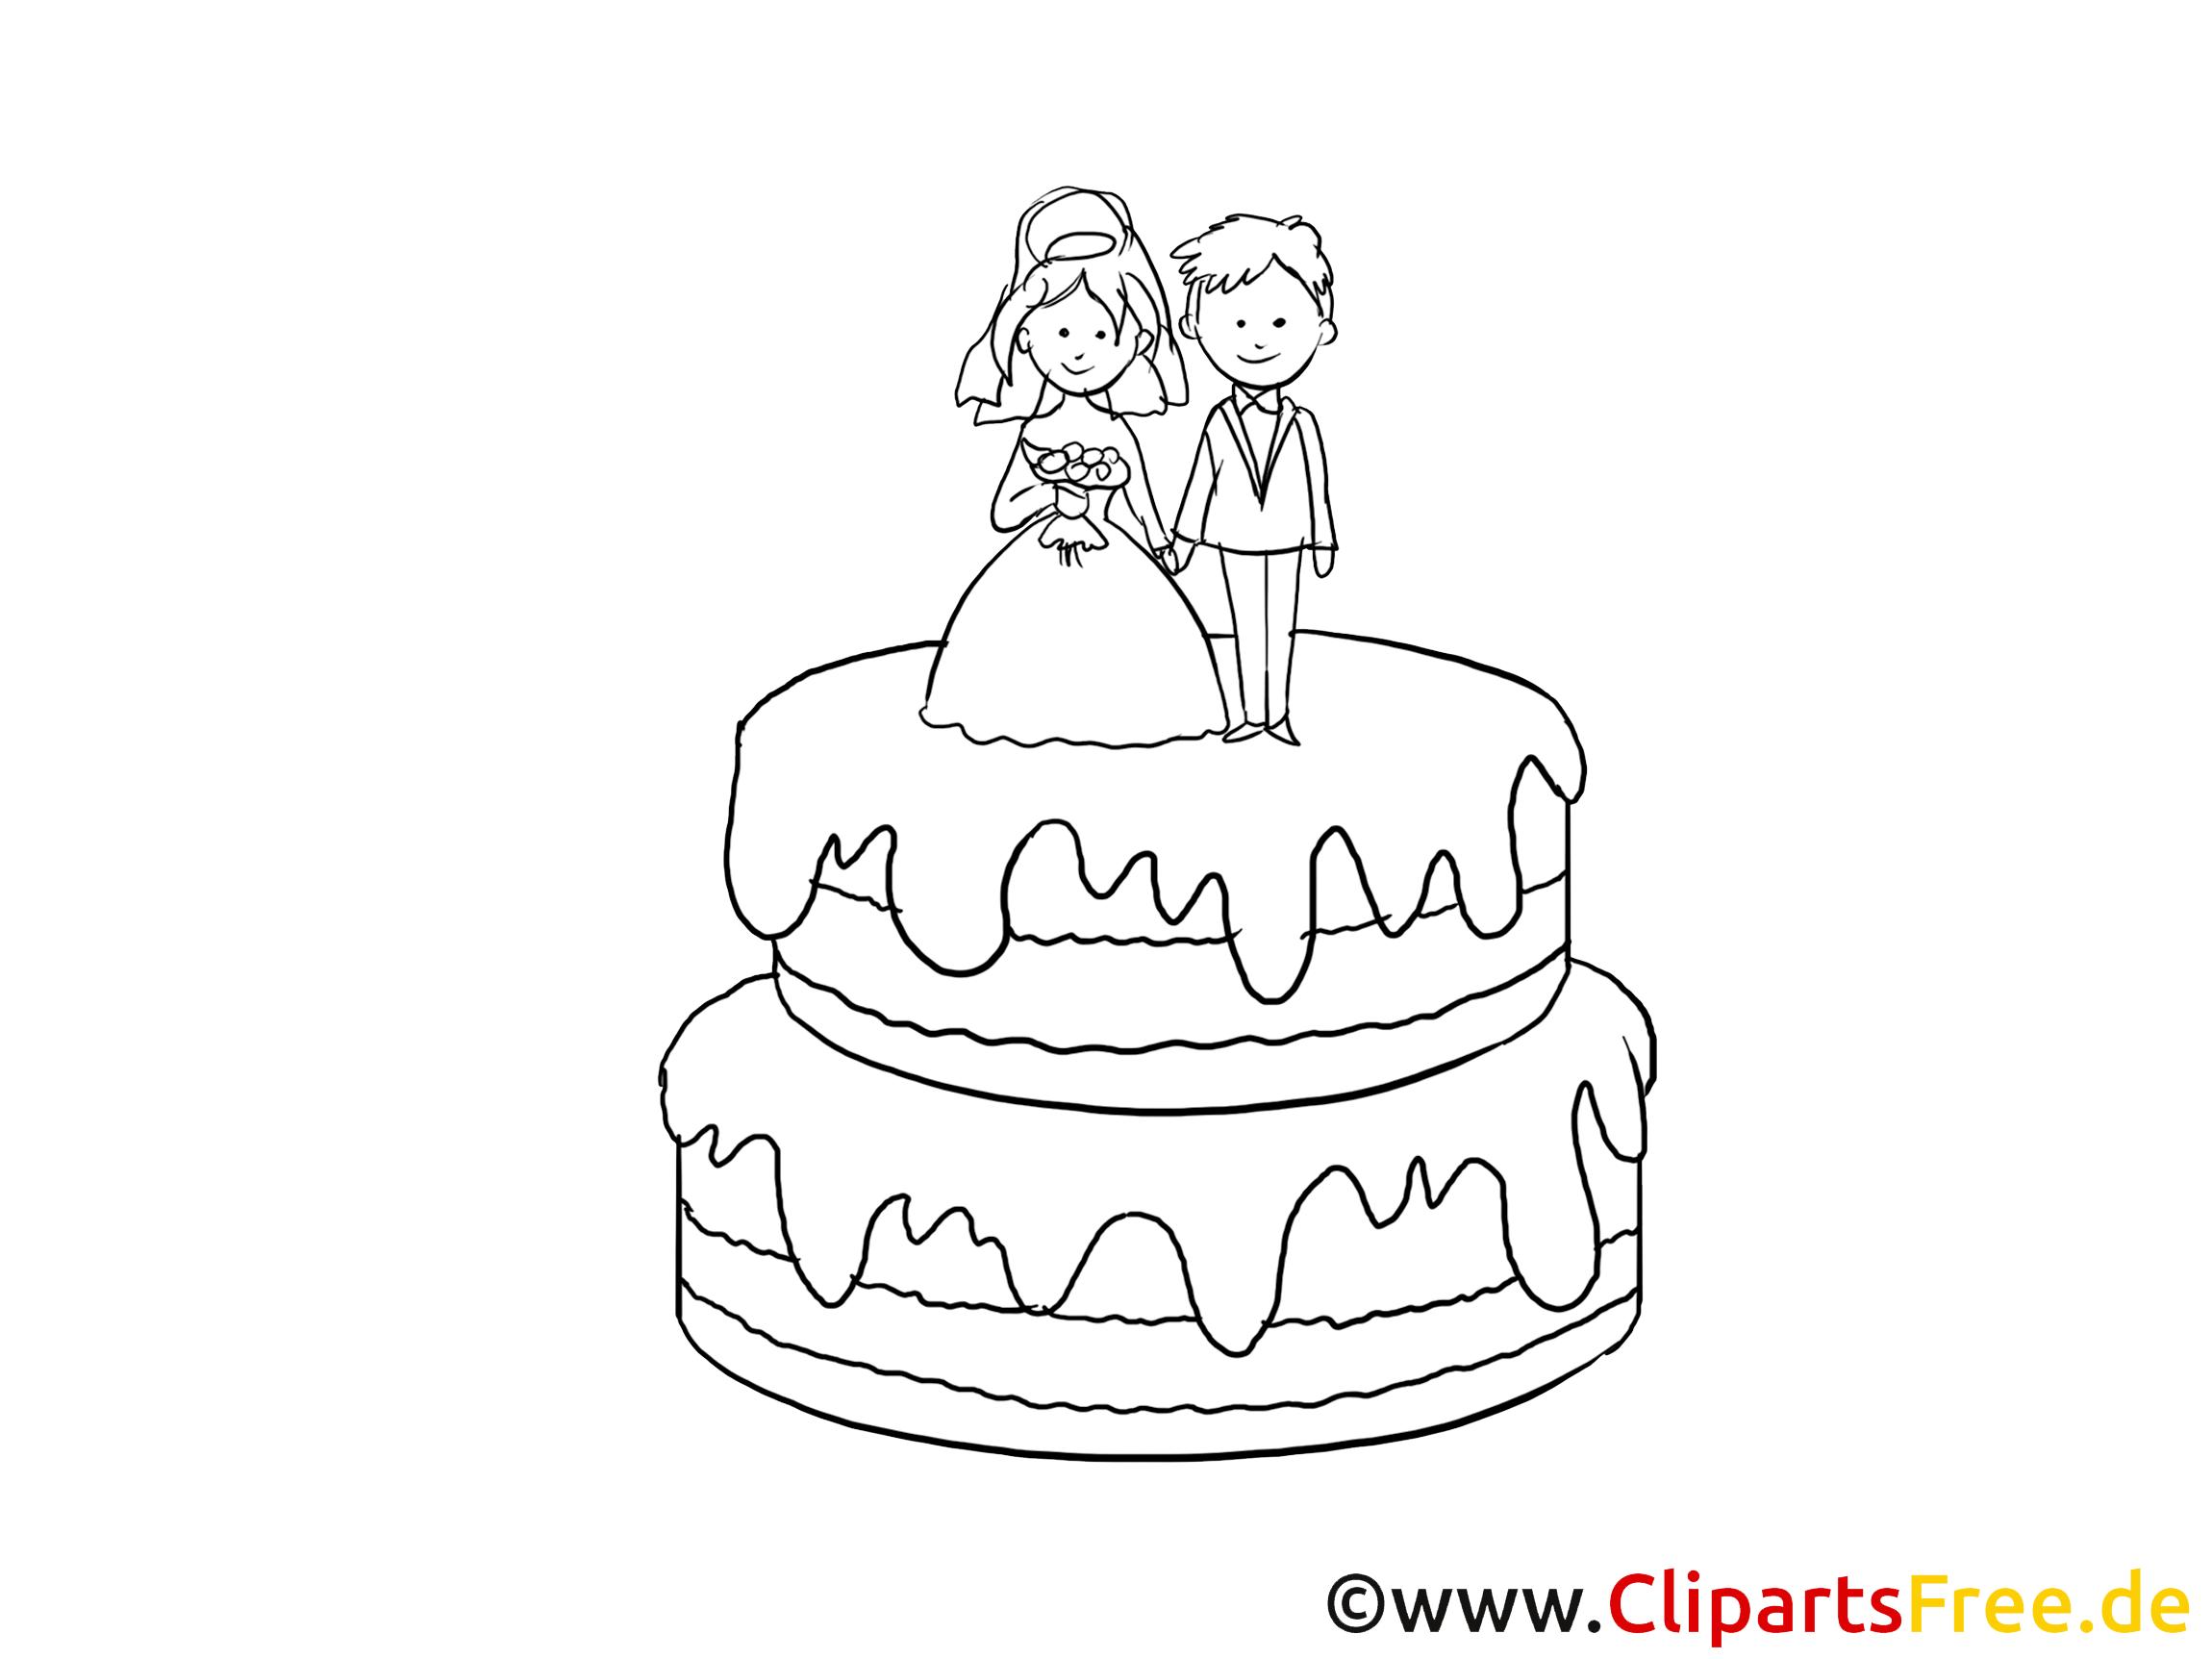 Torte Clipart Schwarz Weiss Gratis